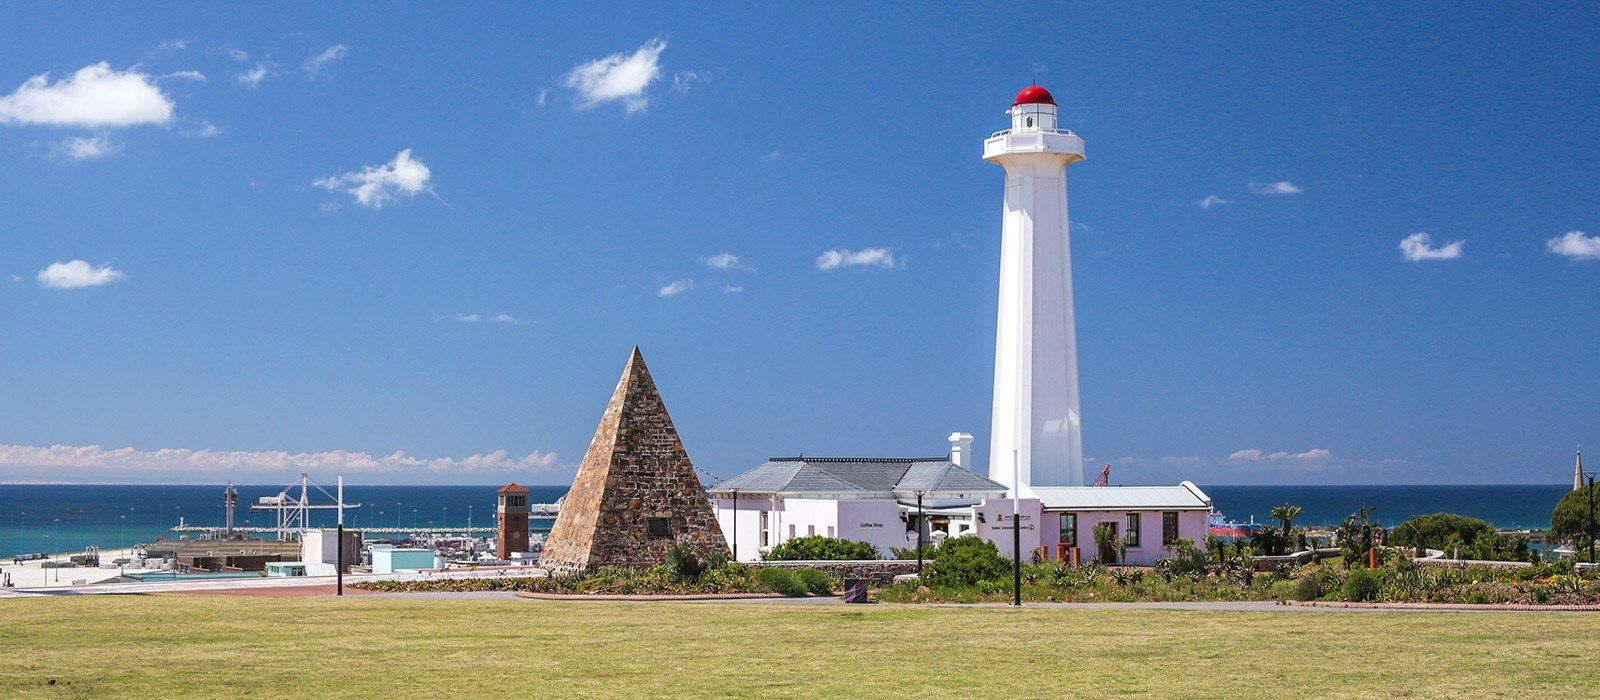 Reiseziel Port Elizabeth Südafrika